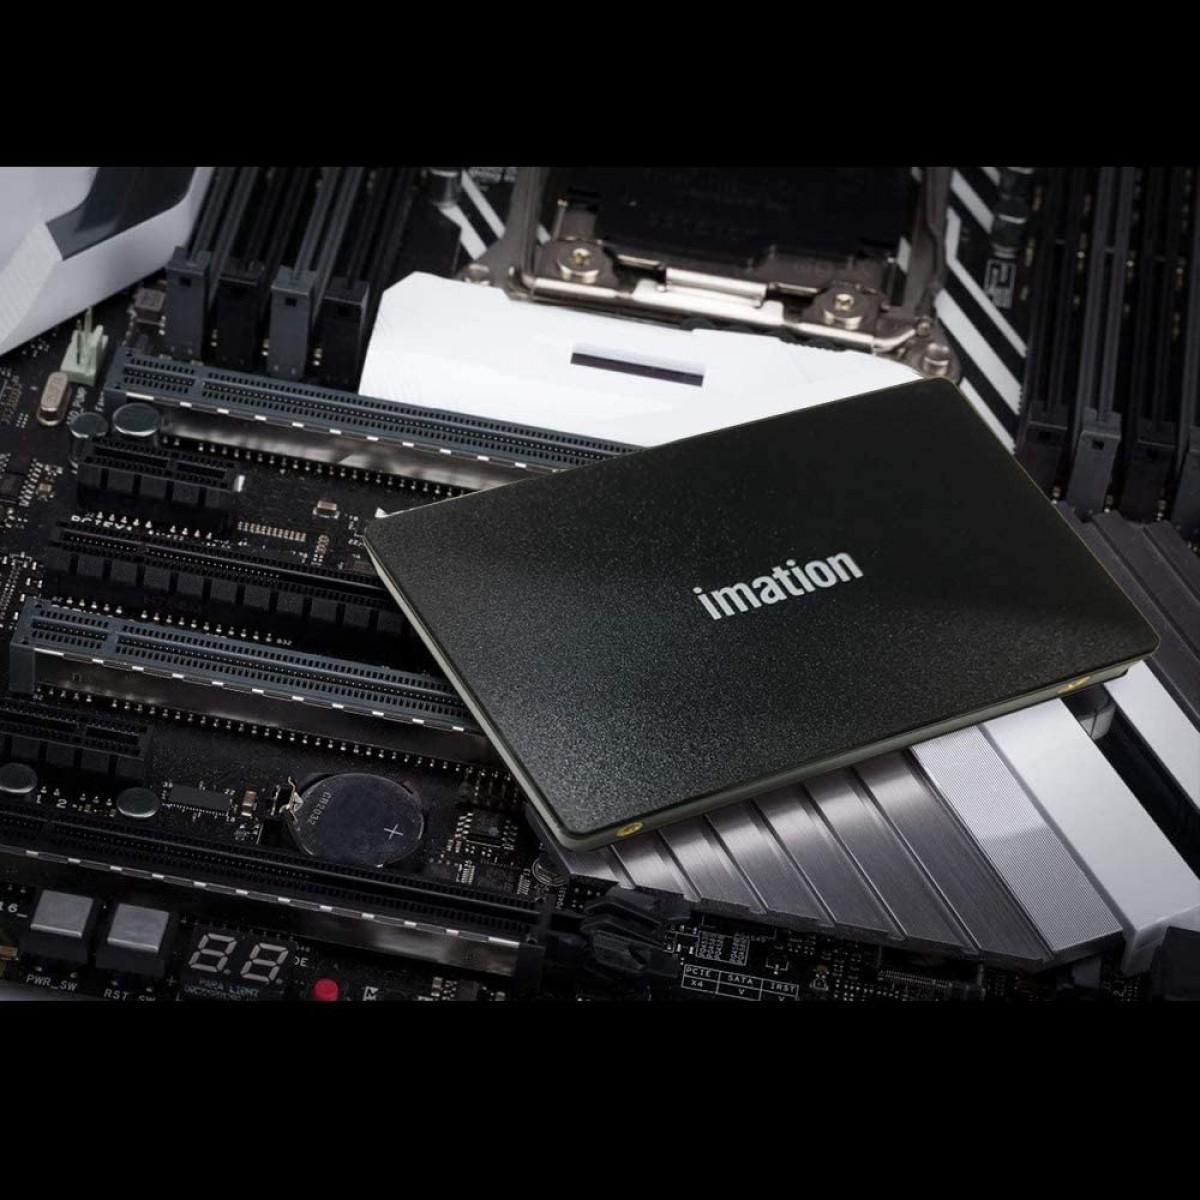 SSD Imation A320, 240GB, Sata III, Leitura 550MBs e Gravação 500MBs, IM240GSSDV01C1N6